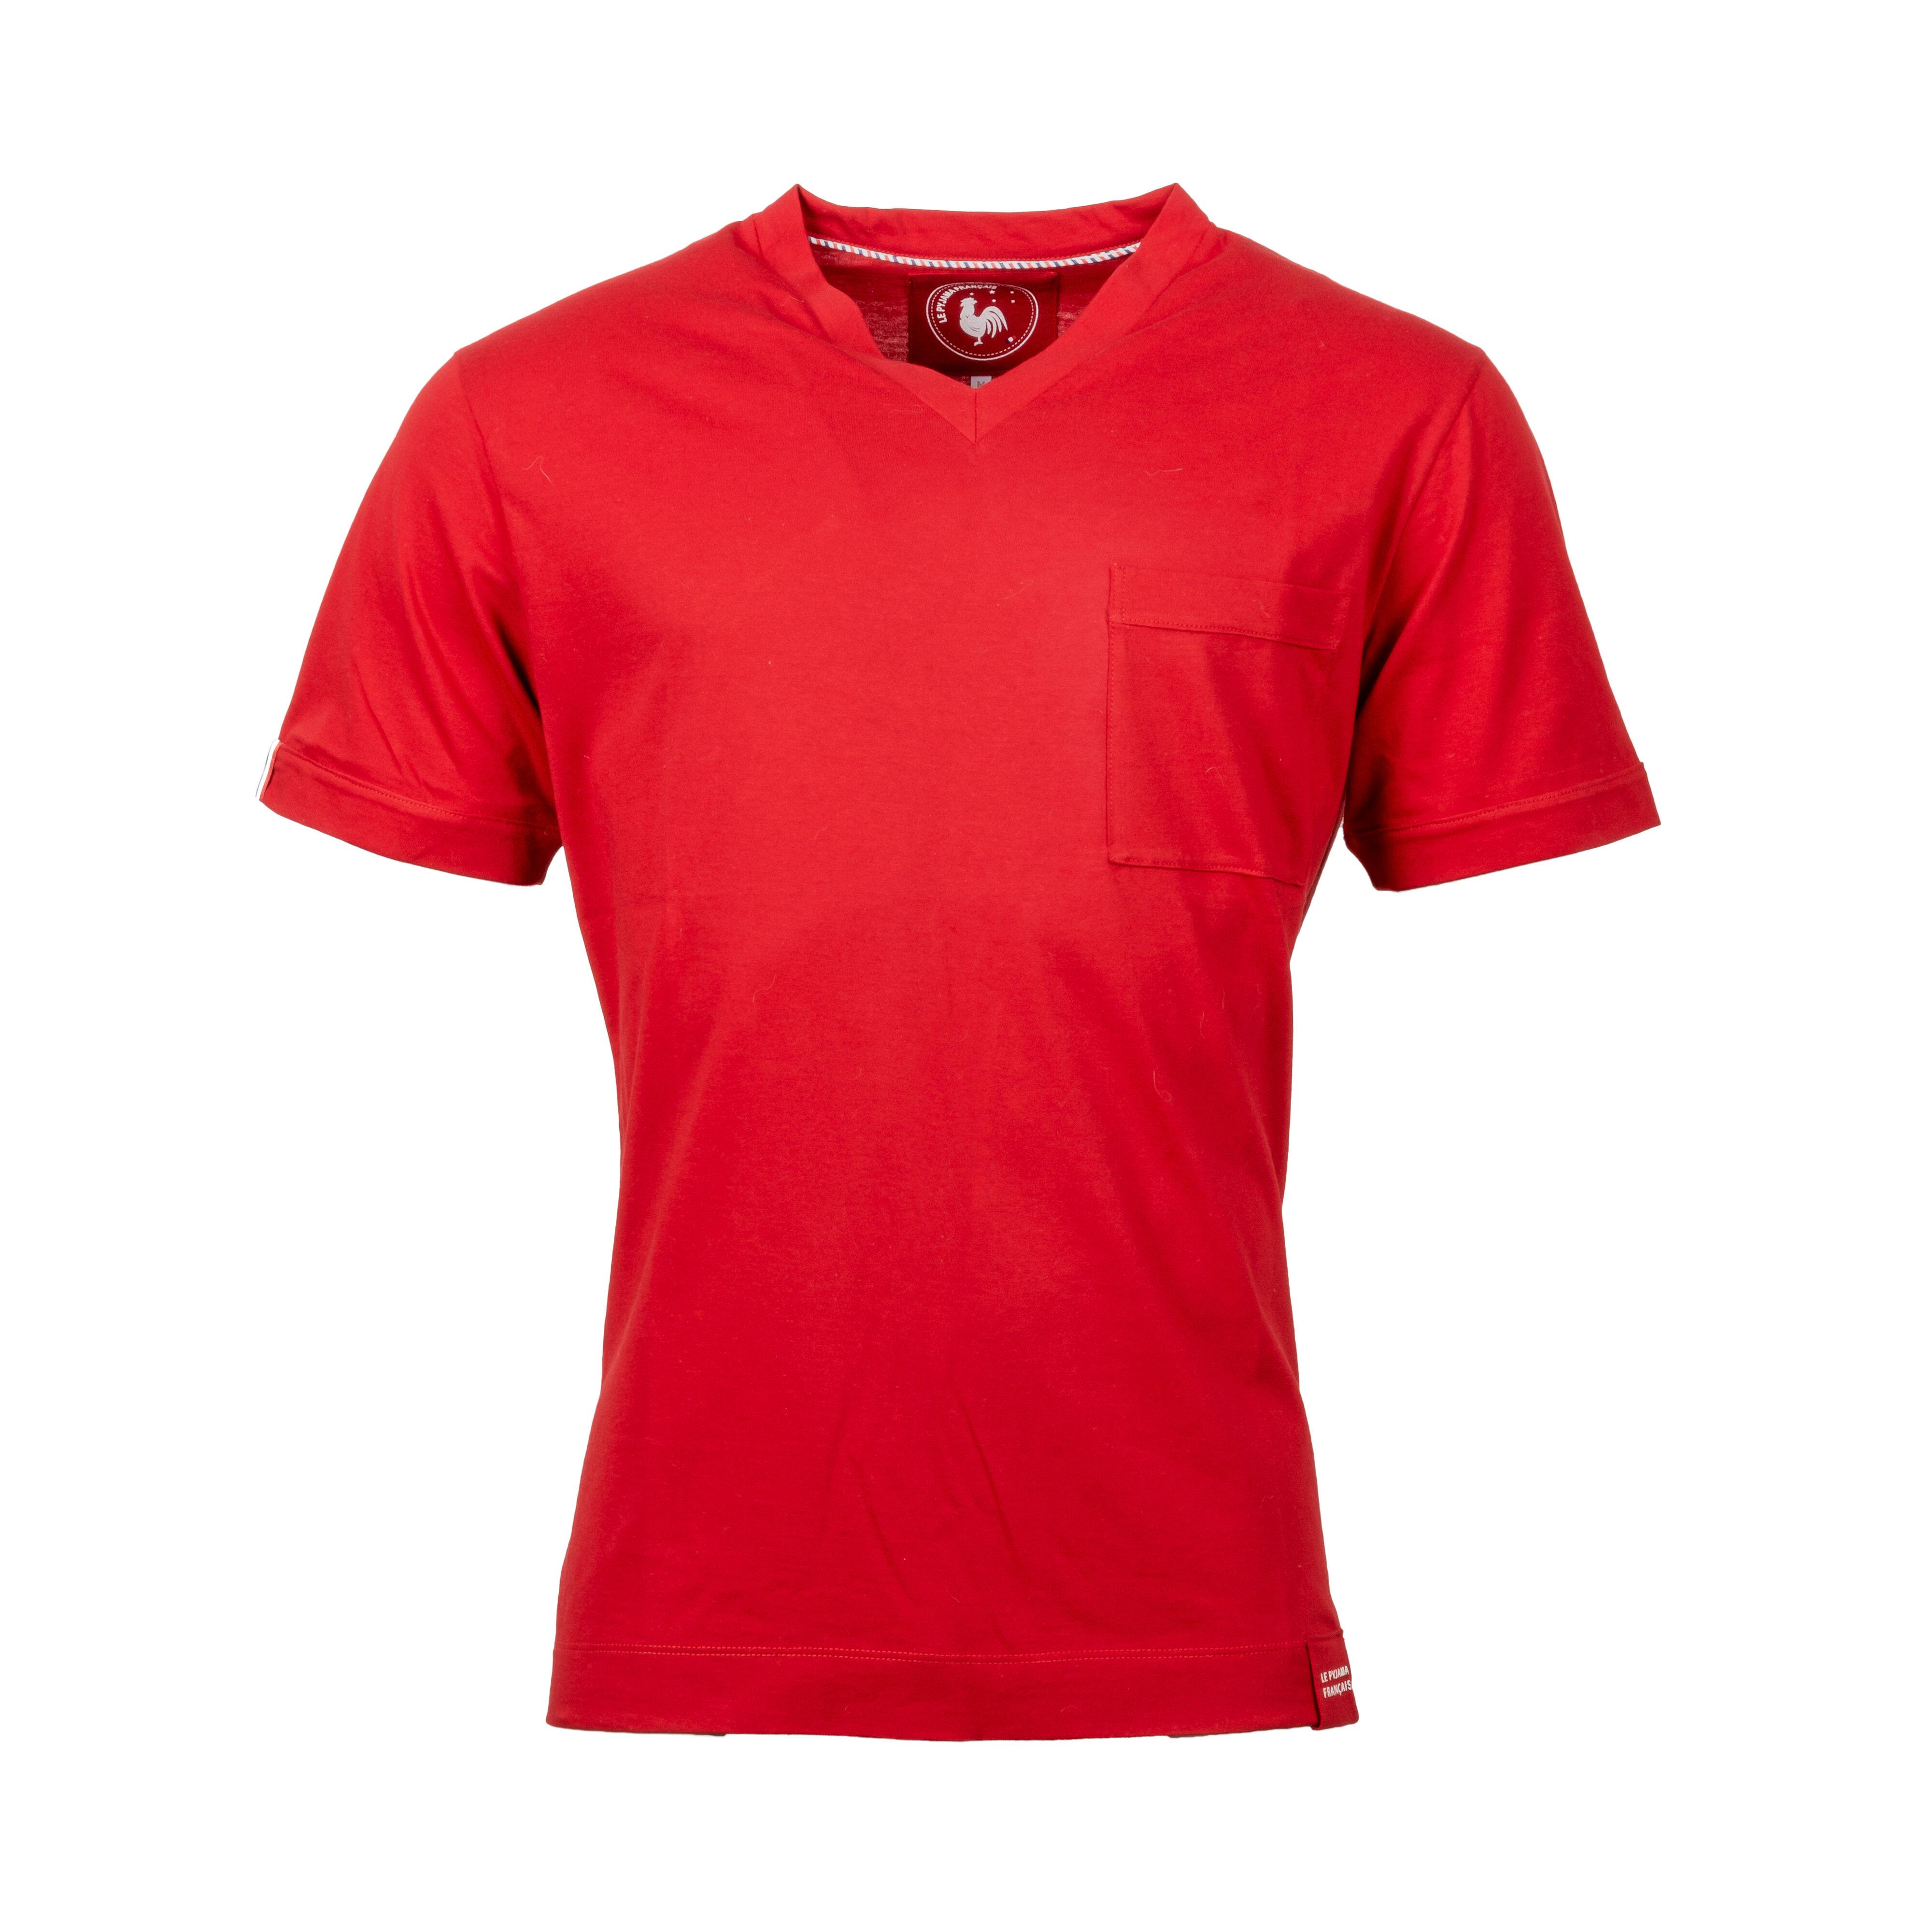 Le Pyjama Français Tee-shirt de pyjama col V Made in France Le Pyjama Français en coton rouge - ROUGE -